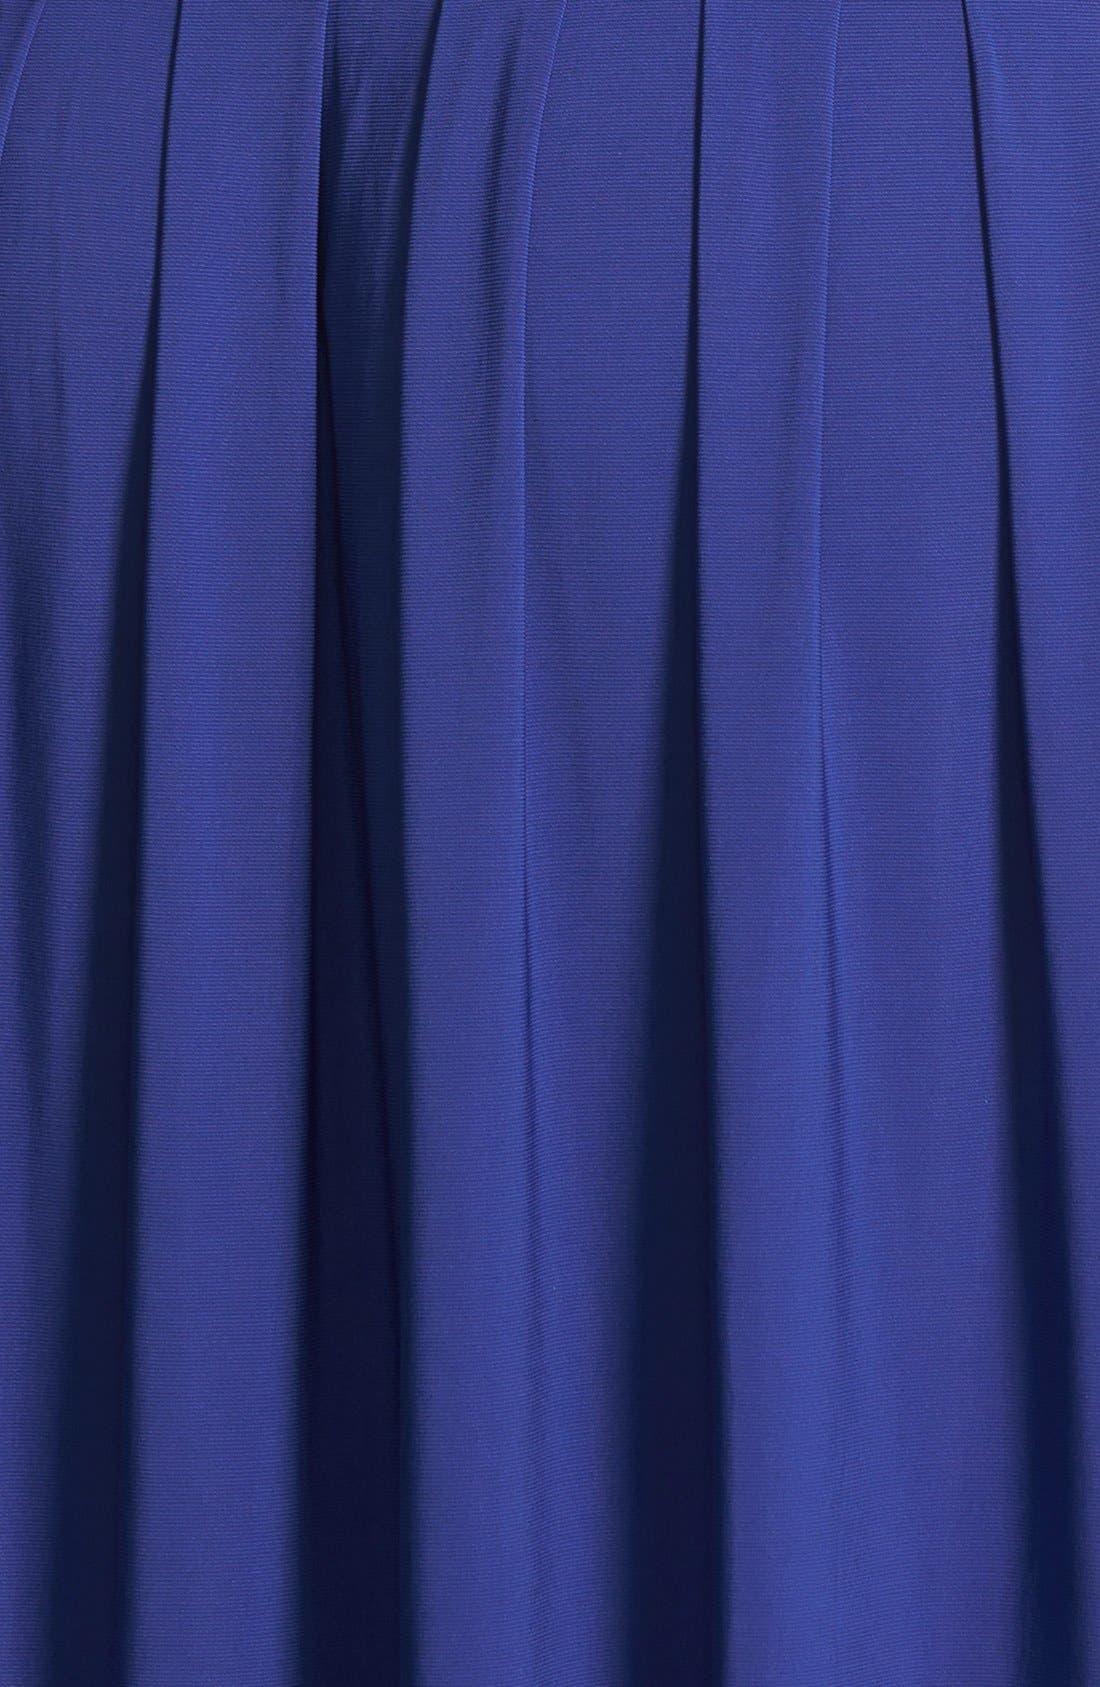 Alternate Image 3  - Eliza J Ruched Stretch Knit Dress (Plus Size) (Online Only)